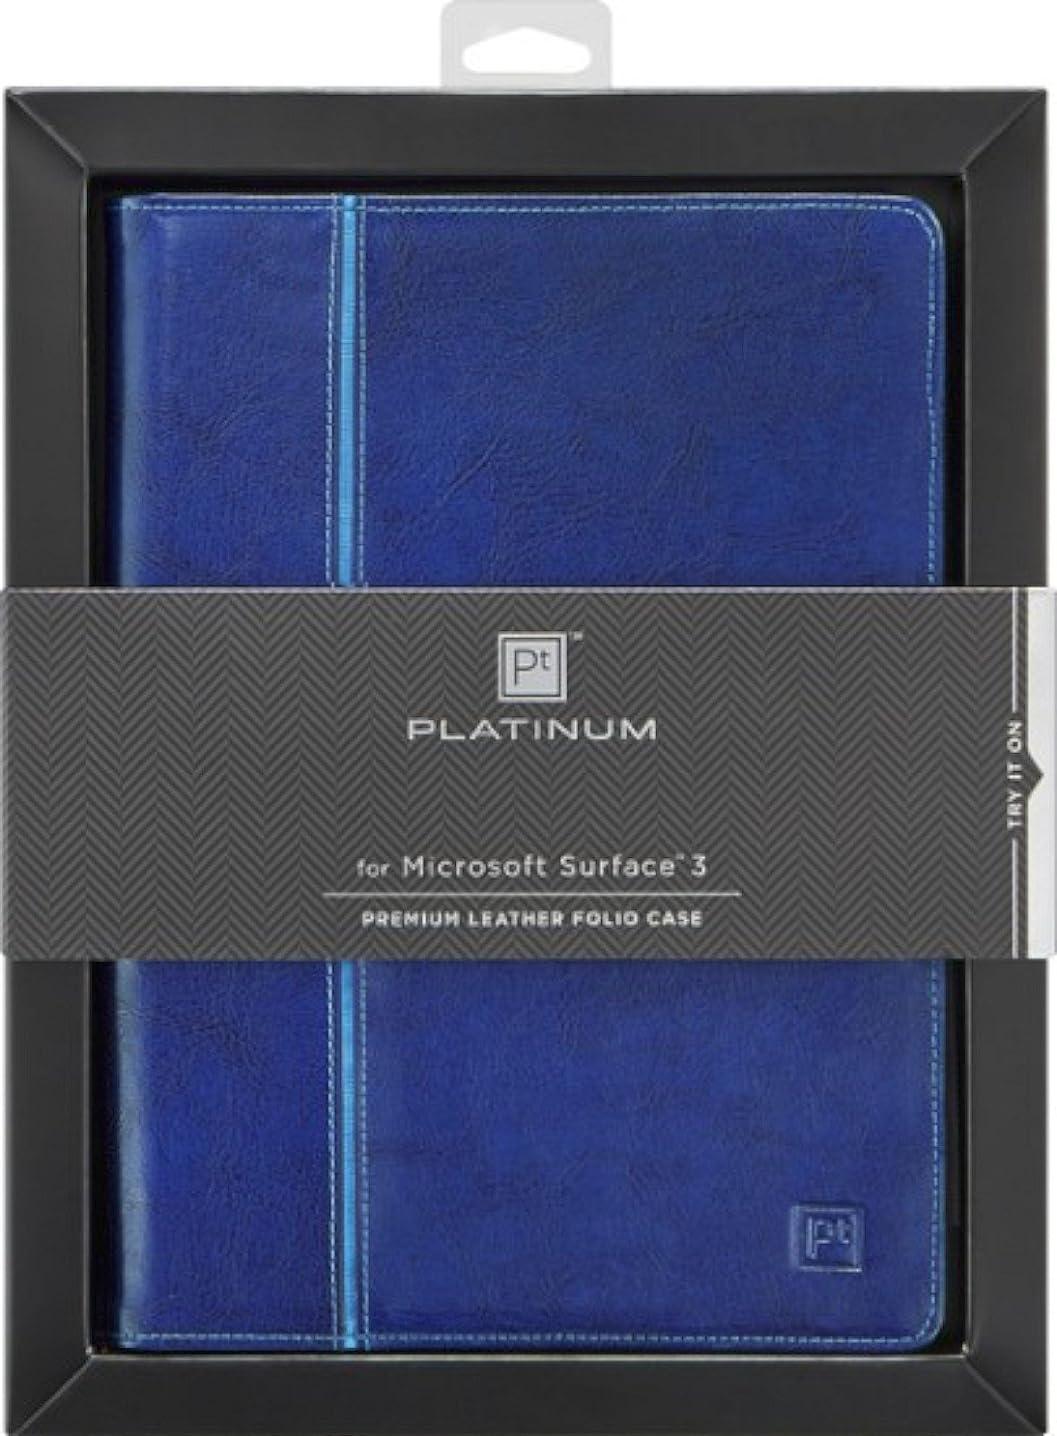 Platinum Leather Folio Case for Microsoft Surface 3